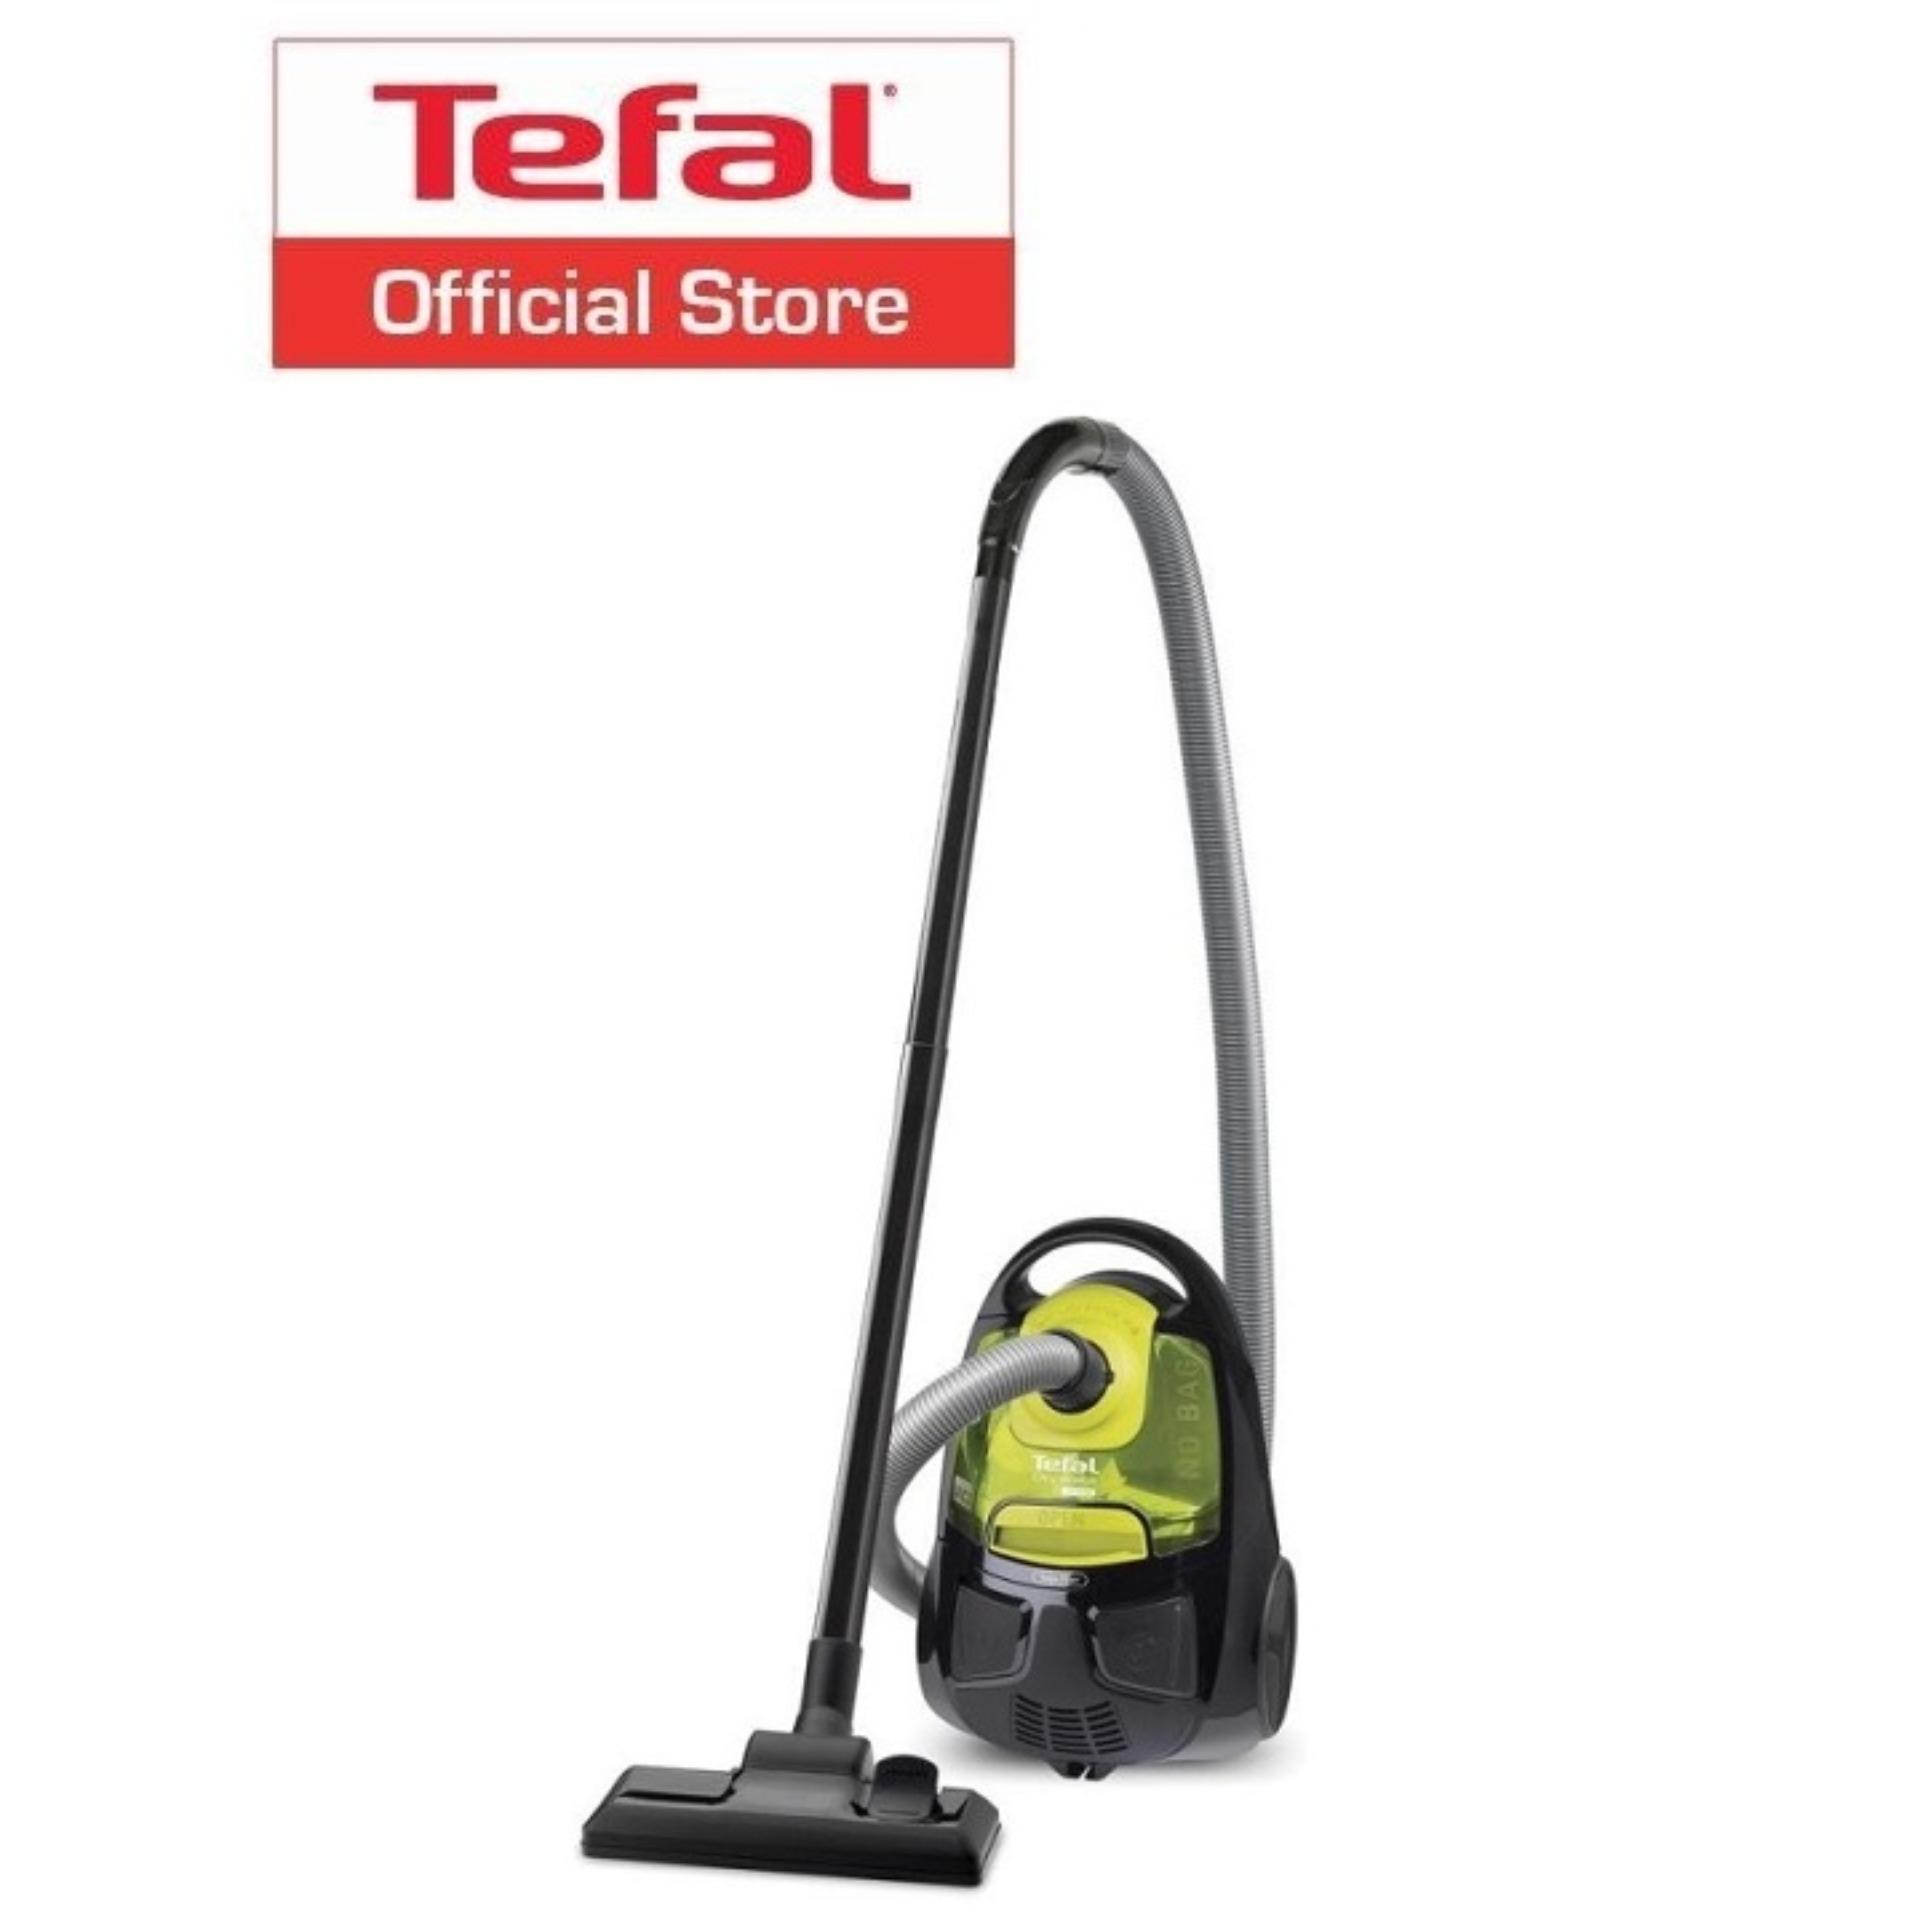 Tefal City Space Cyclonic Bagless Vacuum Cleaner Tw2522 Online